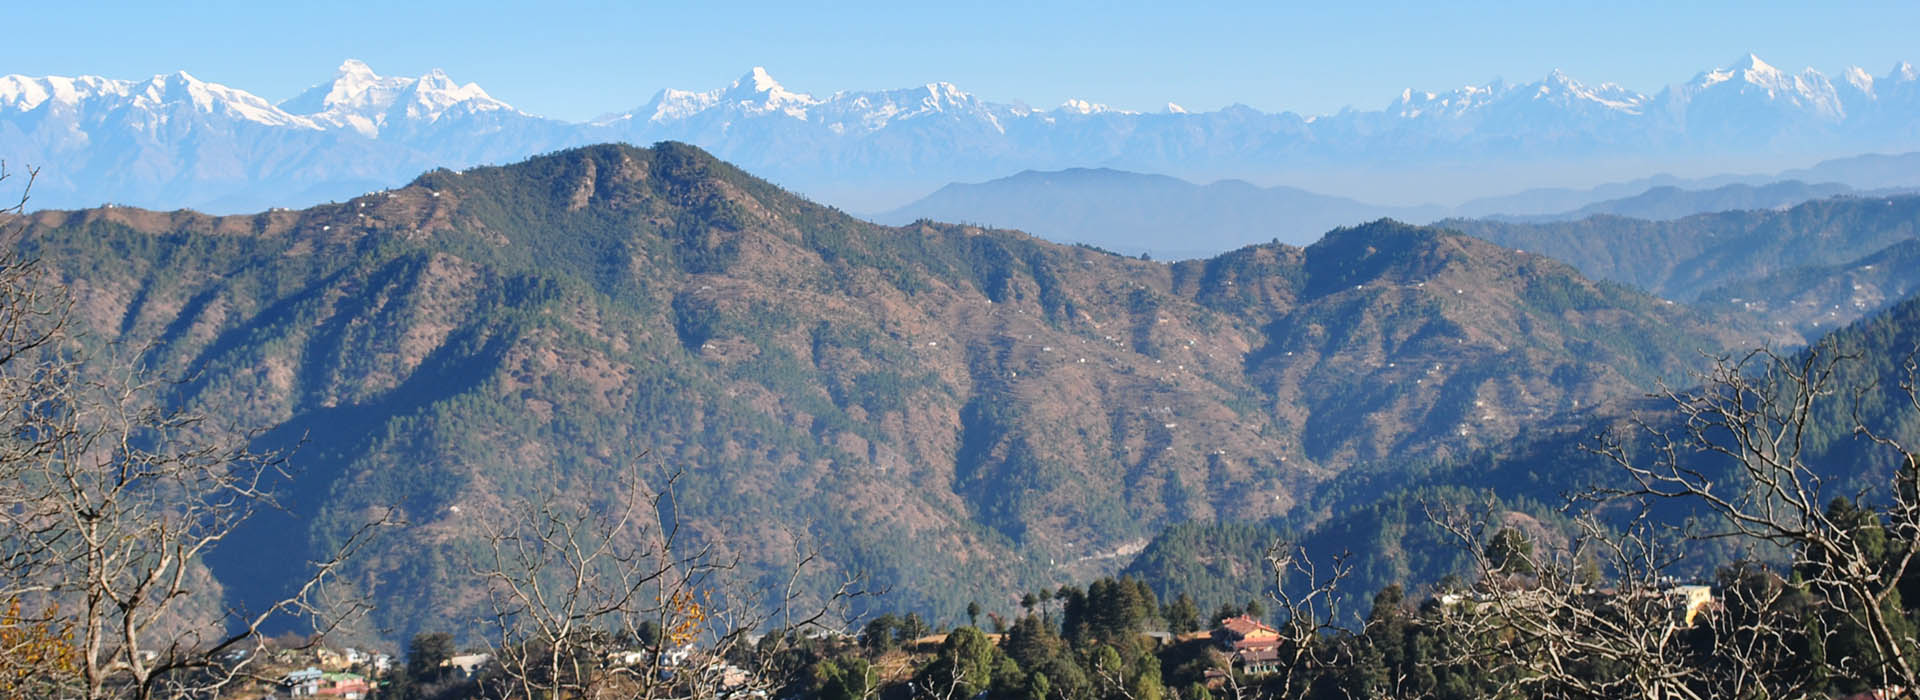 Going beyond Nainital and Mussoorie in Uttarakhand